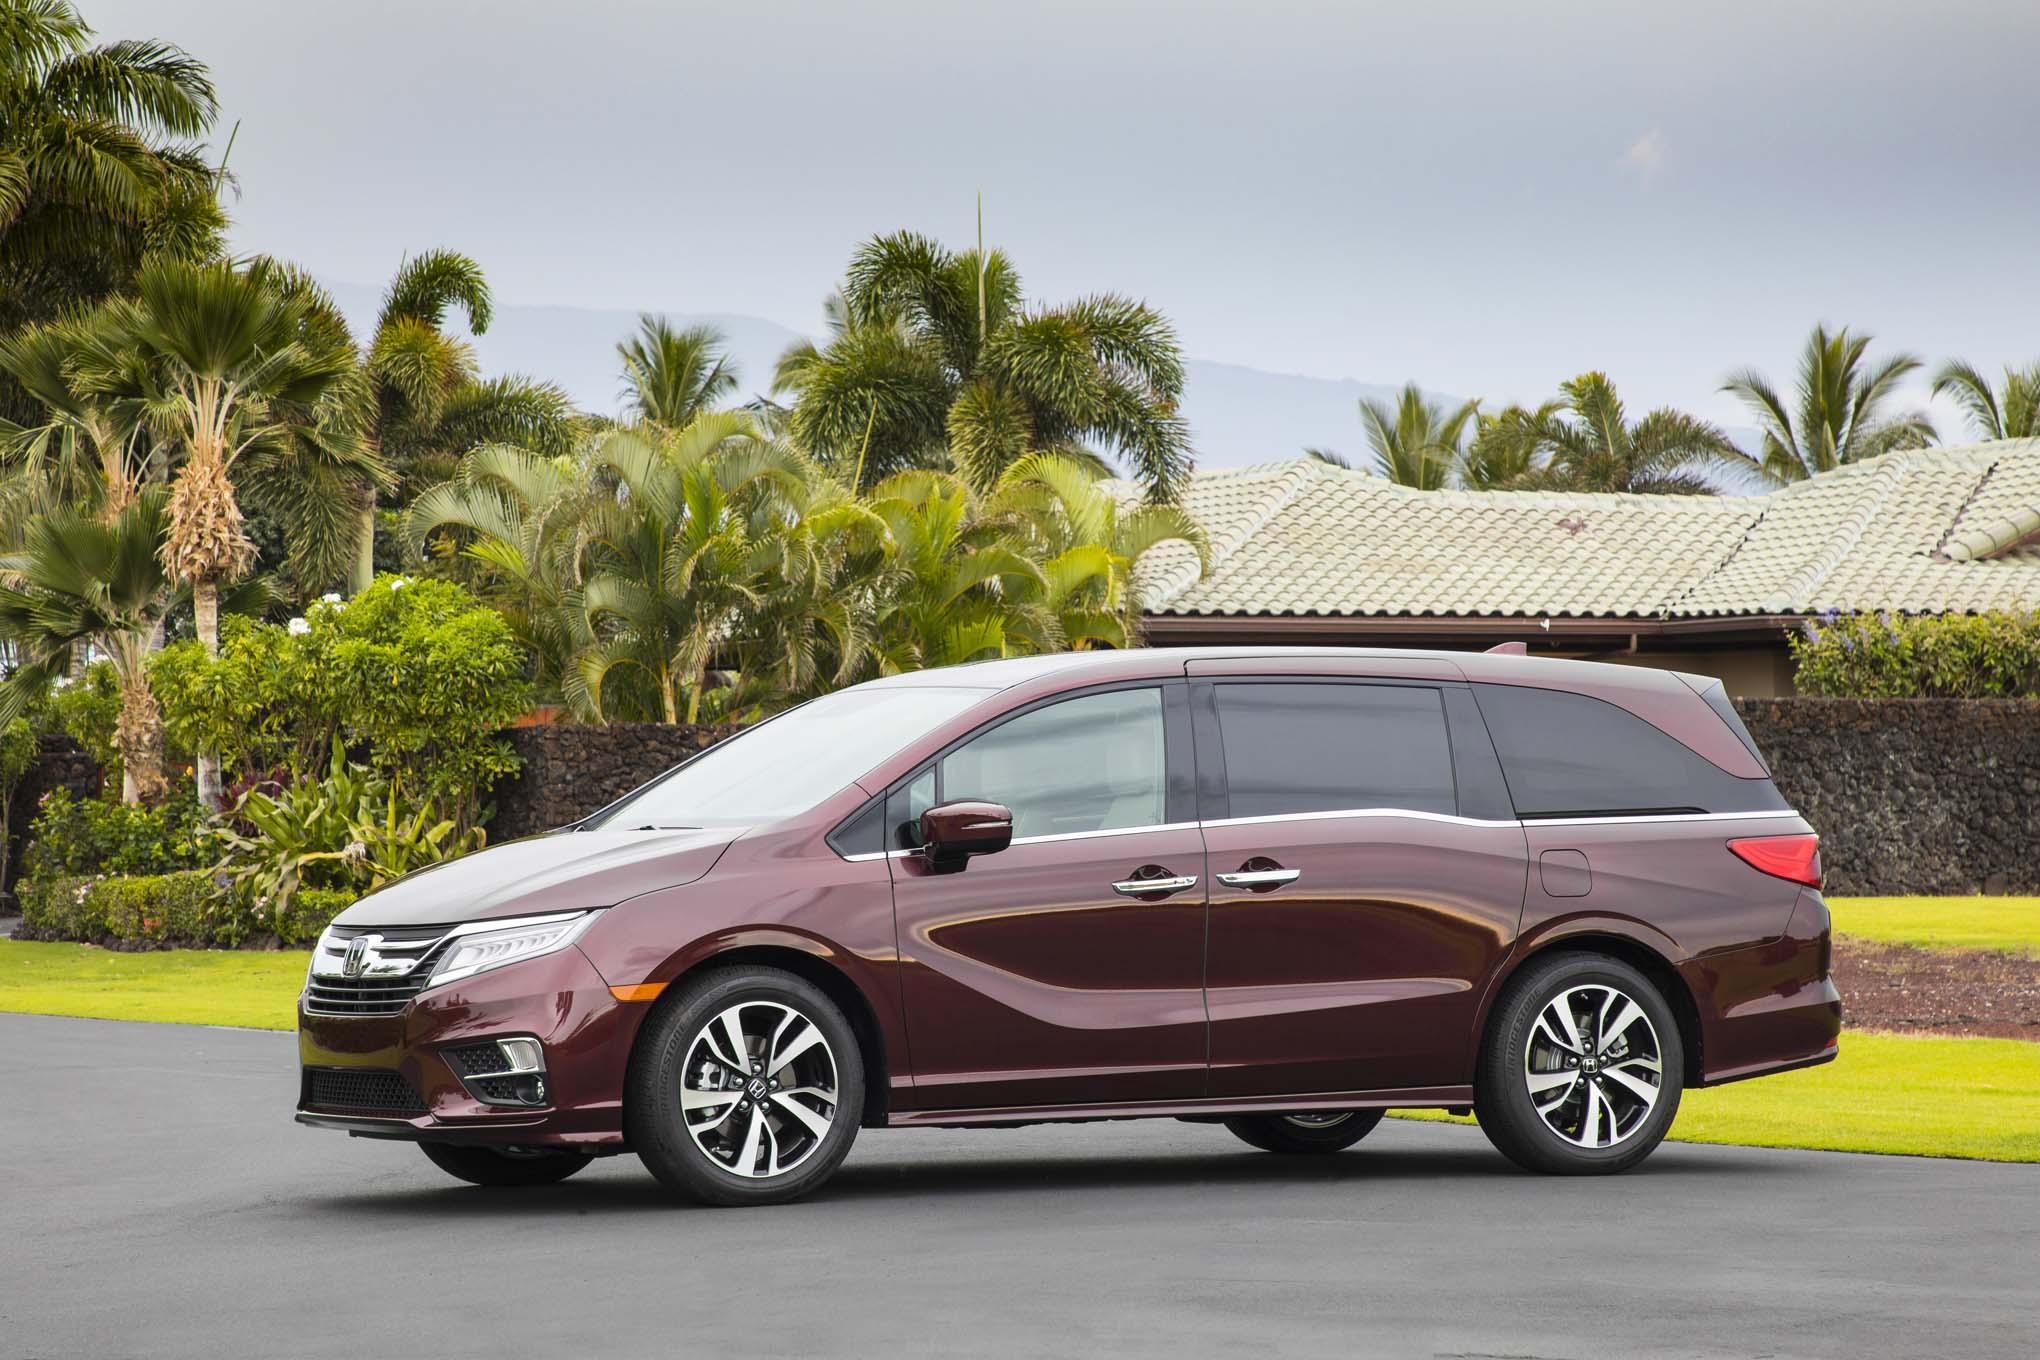 2018 Honda Odyssey Front Three Quarter 13